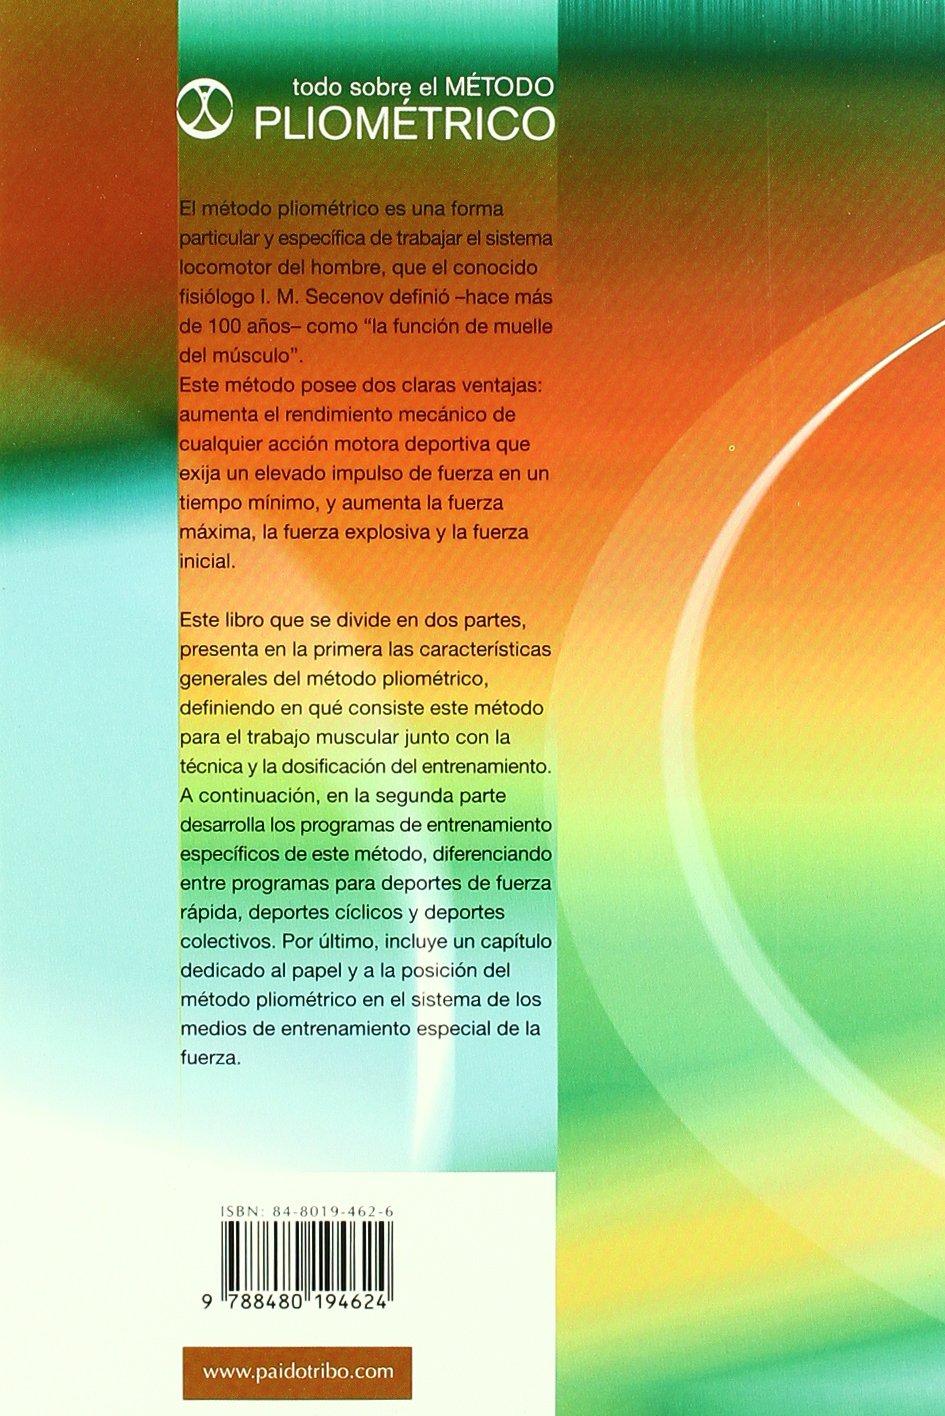 Todo Sobre El Metodo Pliometrico (Spanish Edition): Yury Verkhoshansky: 9788480194624: Amazon.com: Books